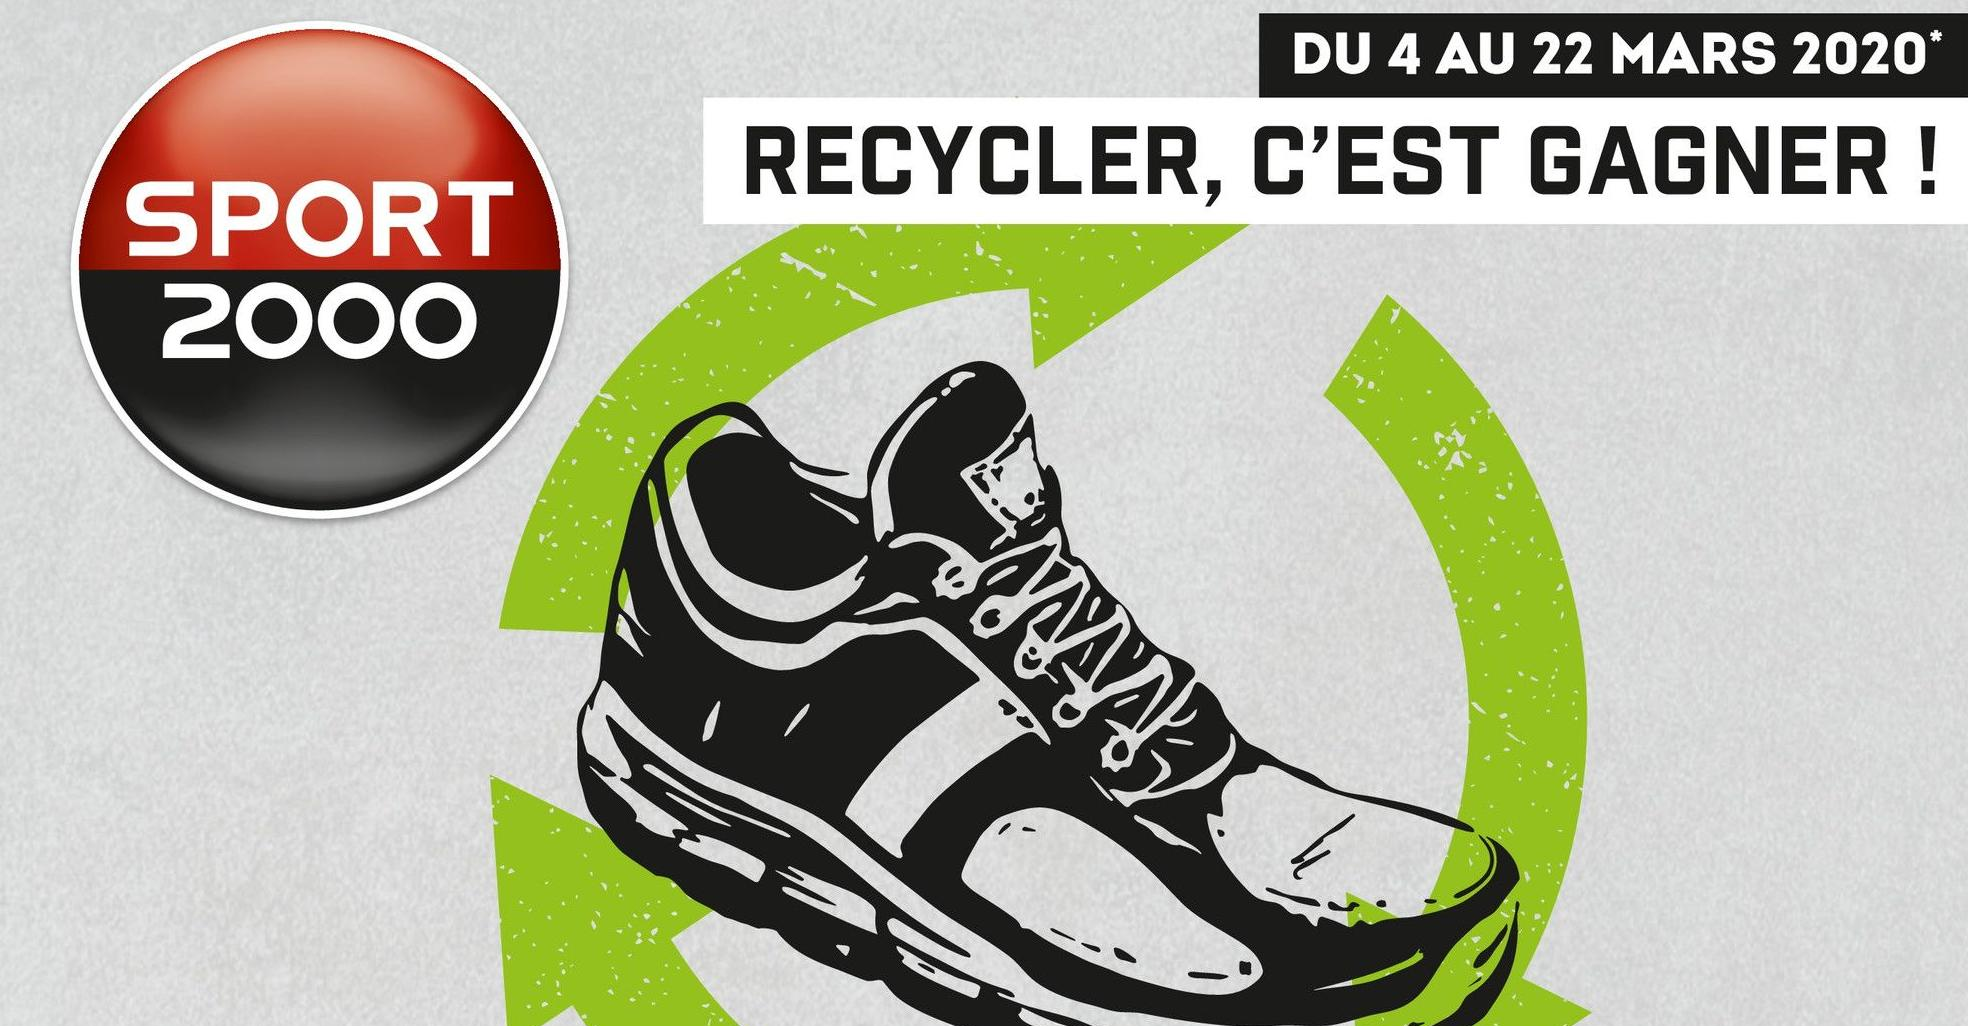 chaussure basket sport 2000,recyclage basket sport